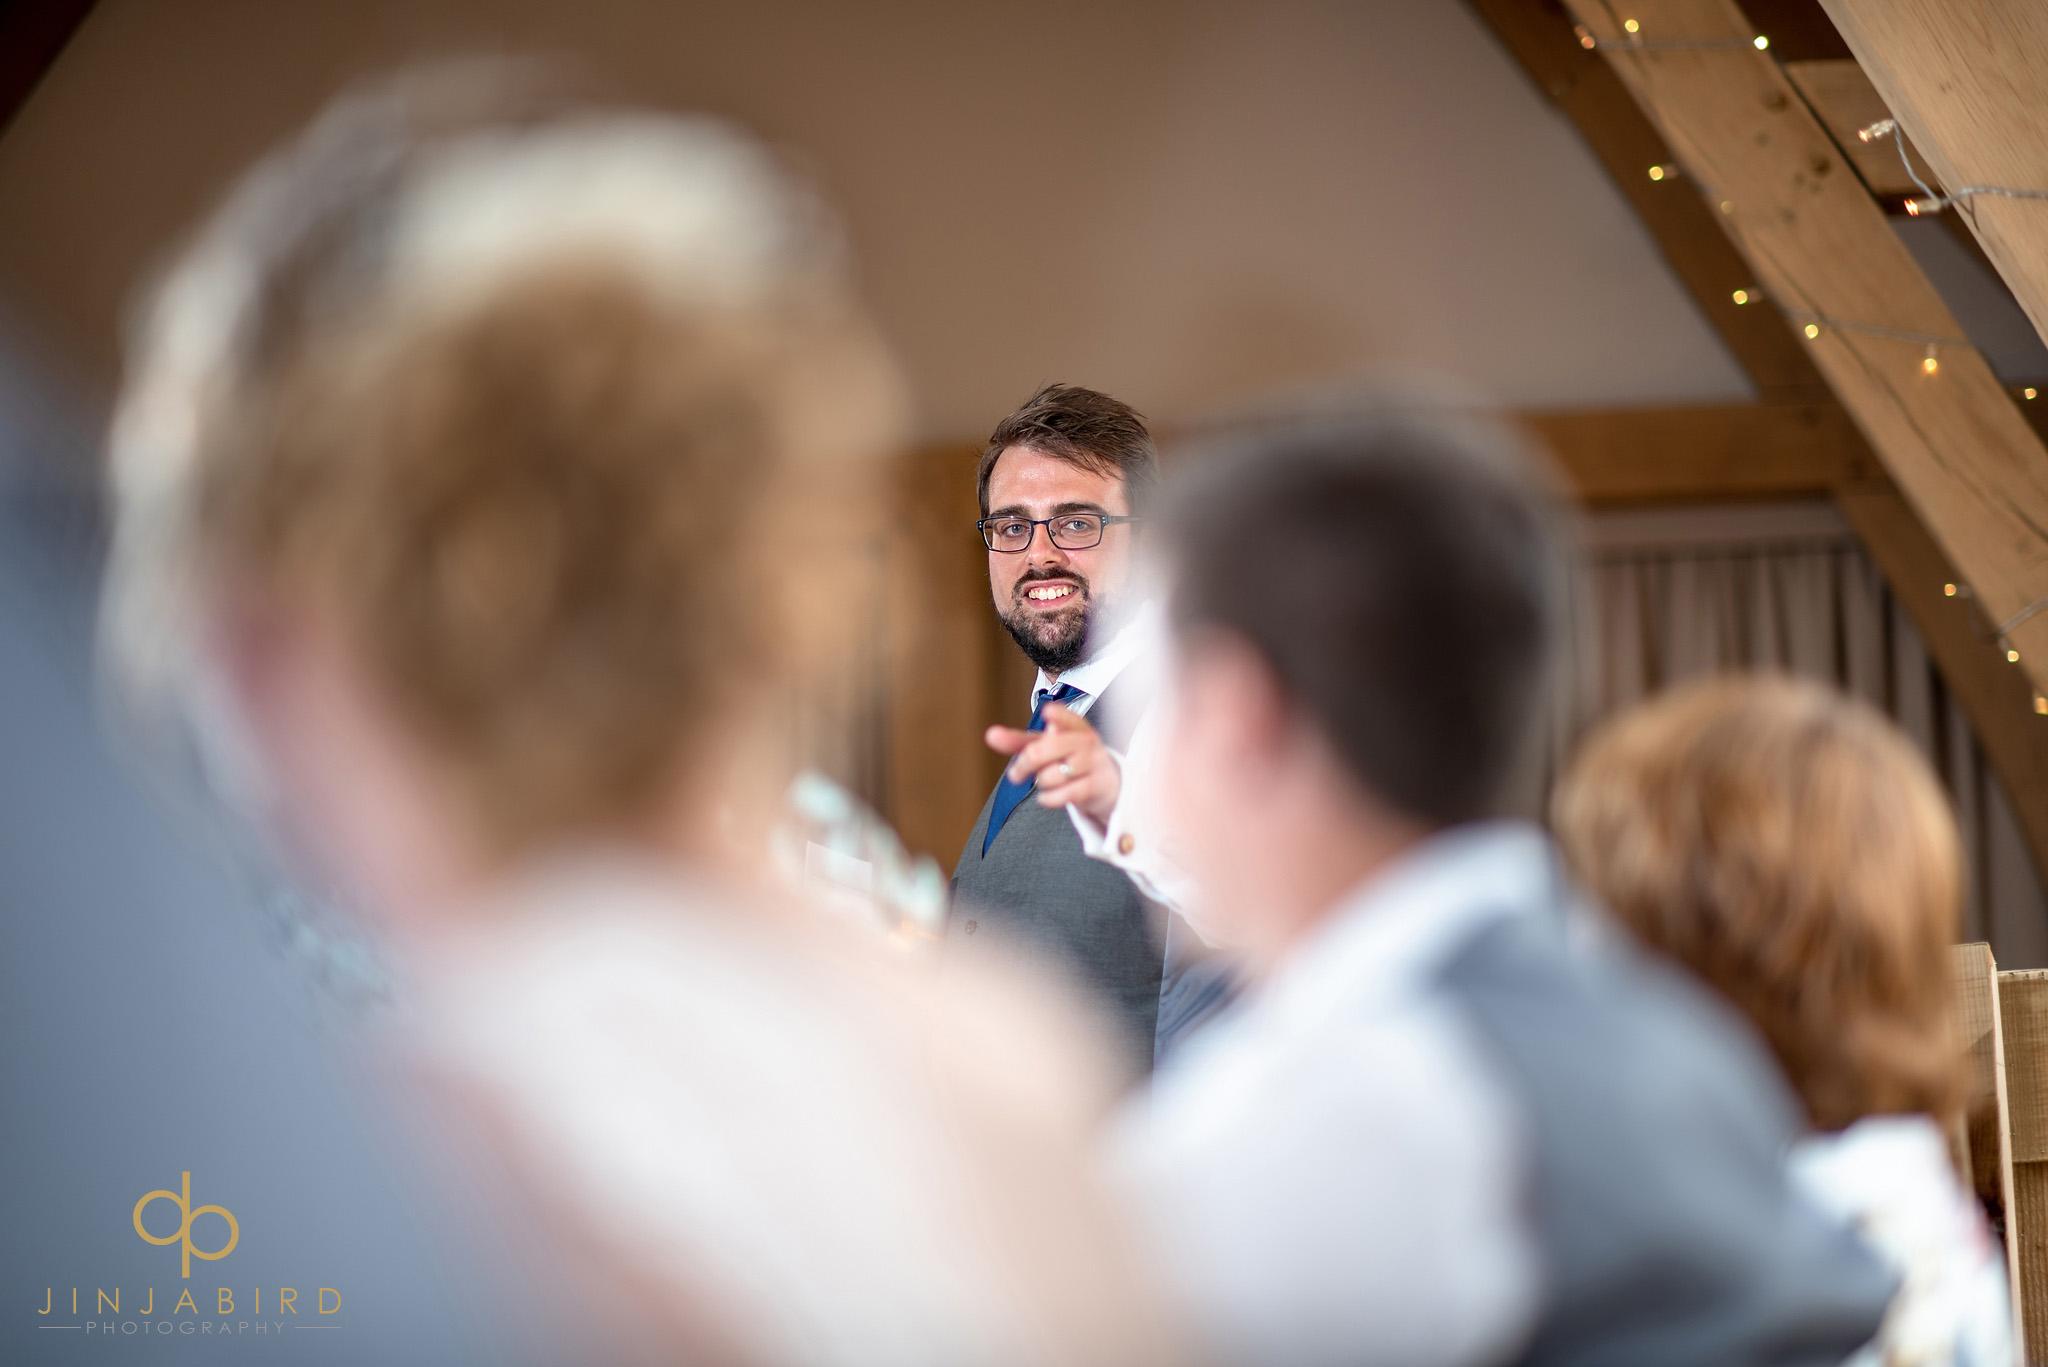 bestman making speech